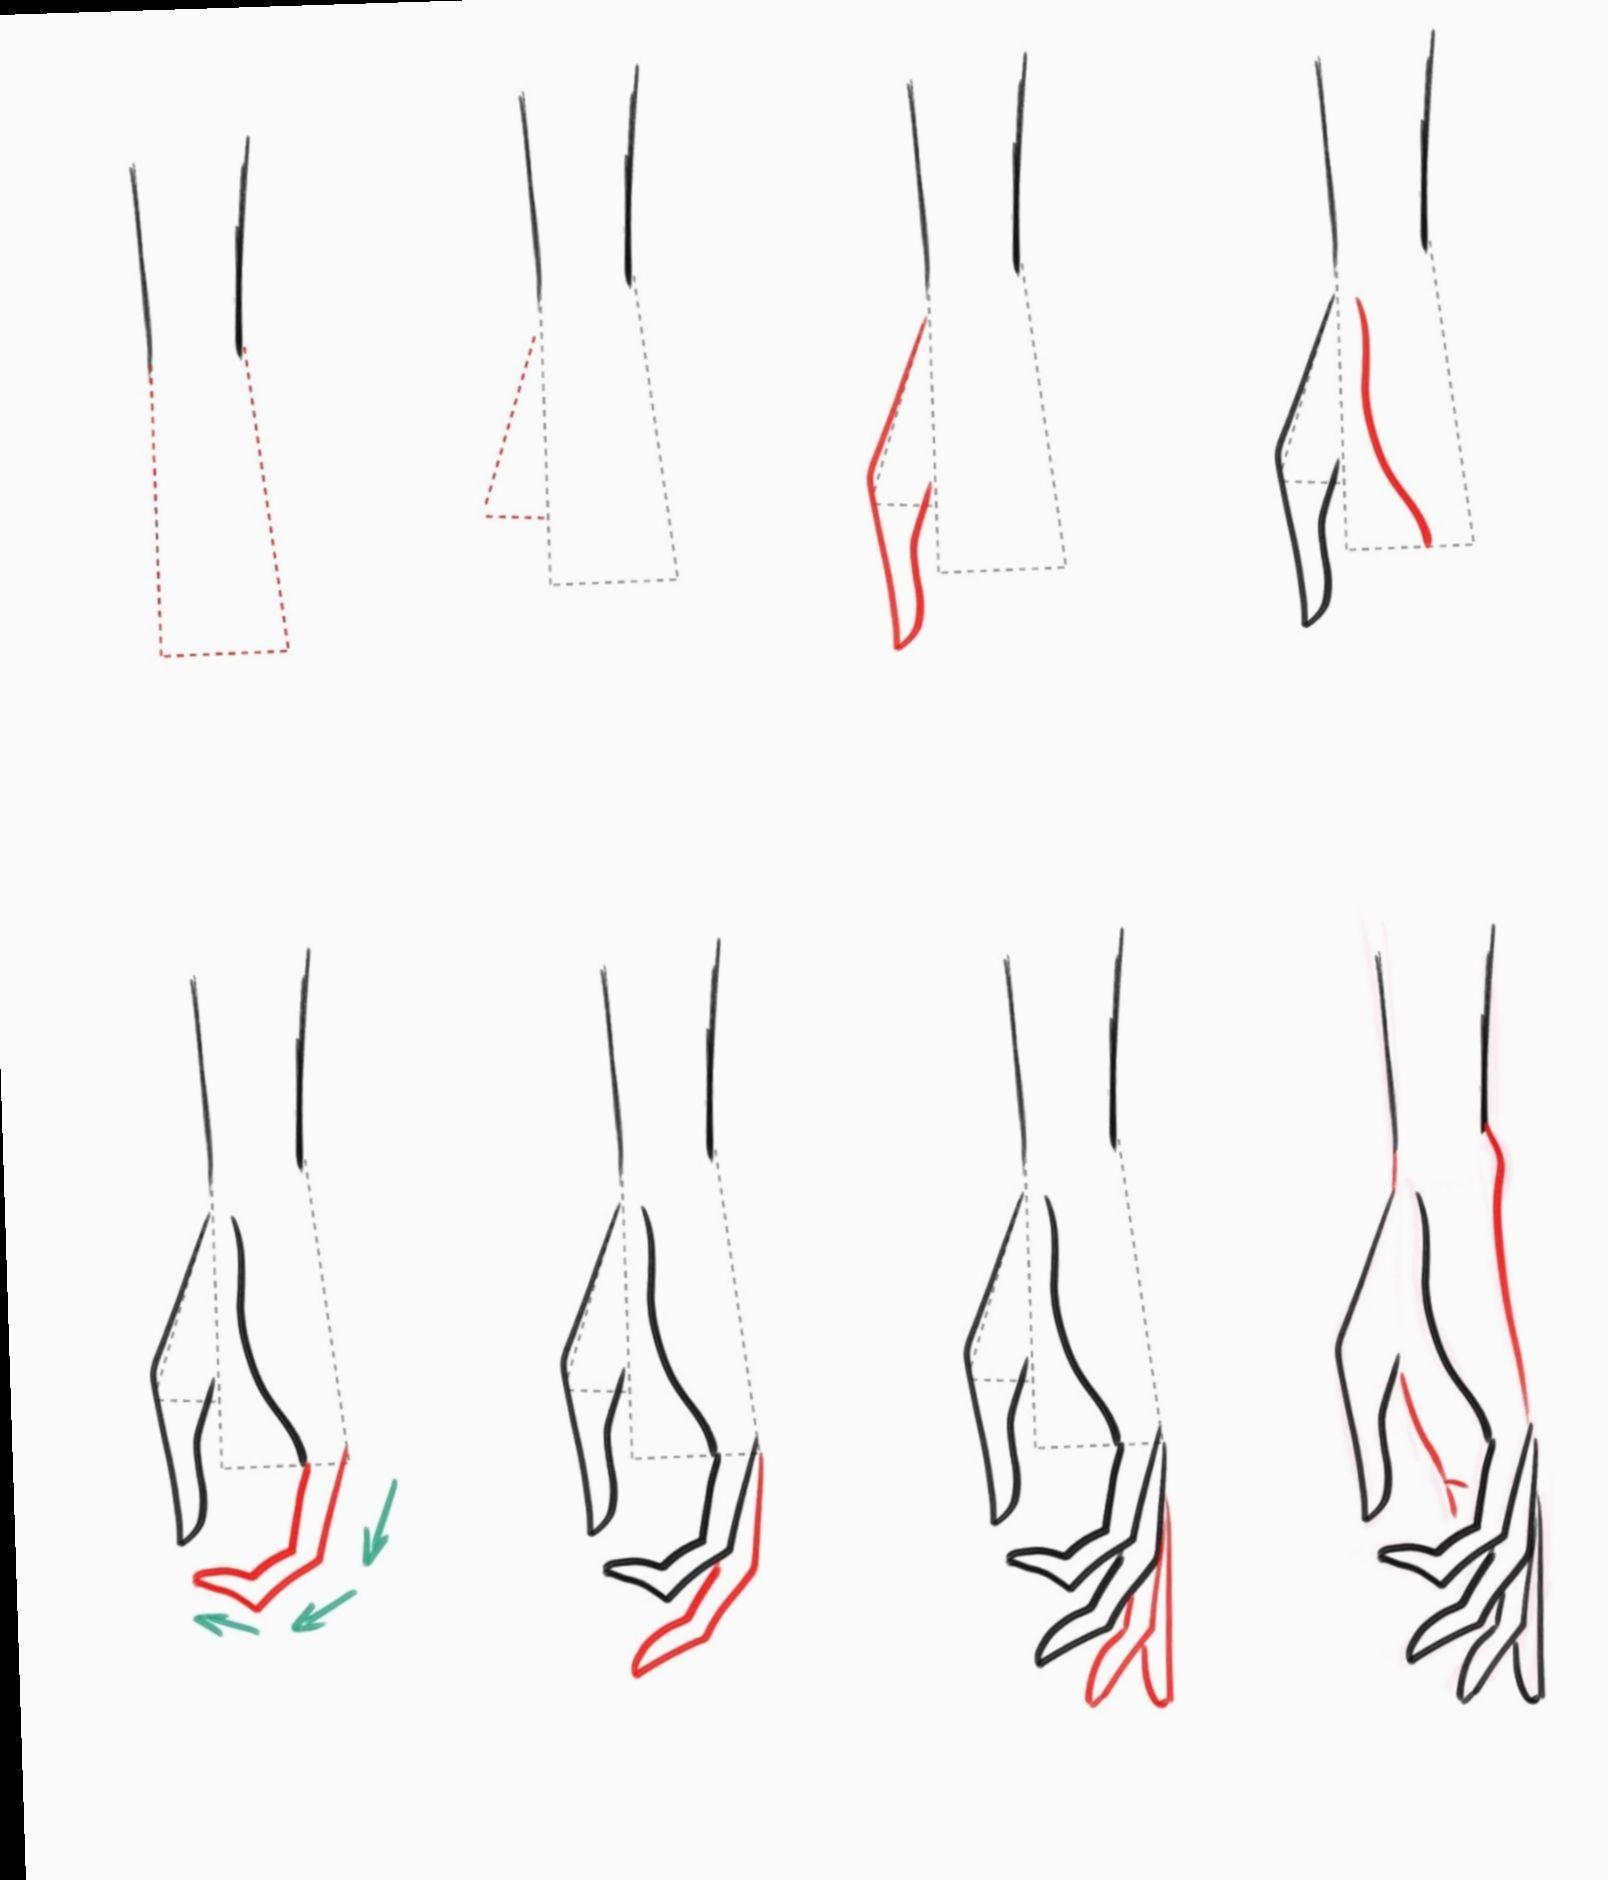 6+ Fashion Sketchbook Videos Template -  6+ Fashion Sketchbook Videos Template  - #Fashion #fashioneditorial #fashionideas #fashionshow #fashionsketchbook #rosetattooideas #Sketchbook #tattooideasfoot #tattooideasformoms #template #Videos